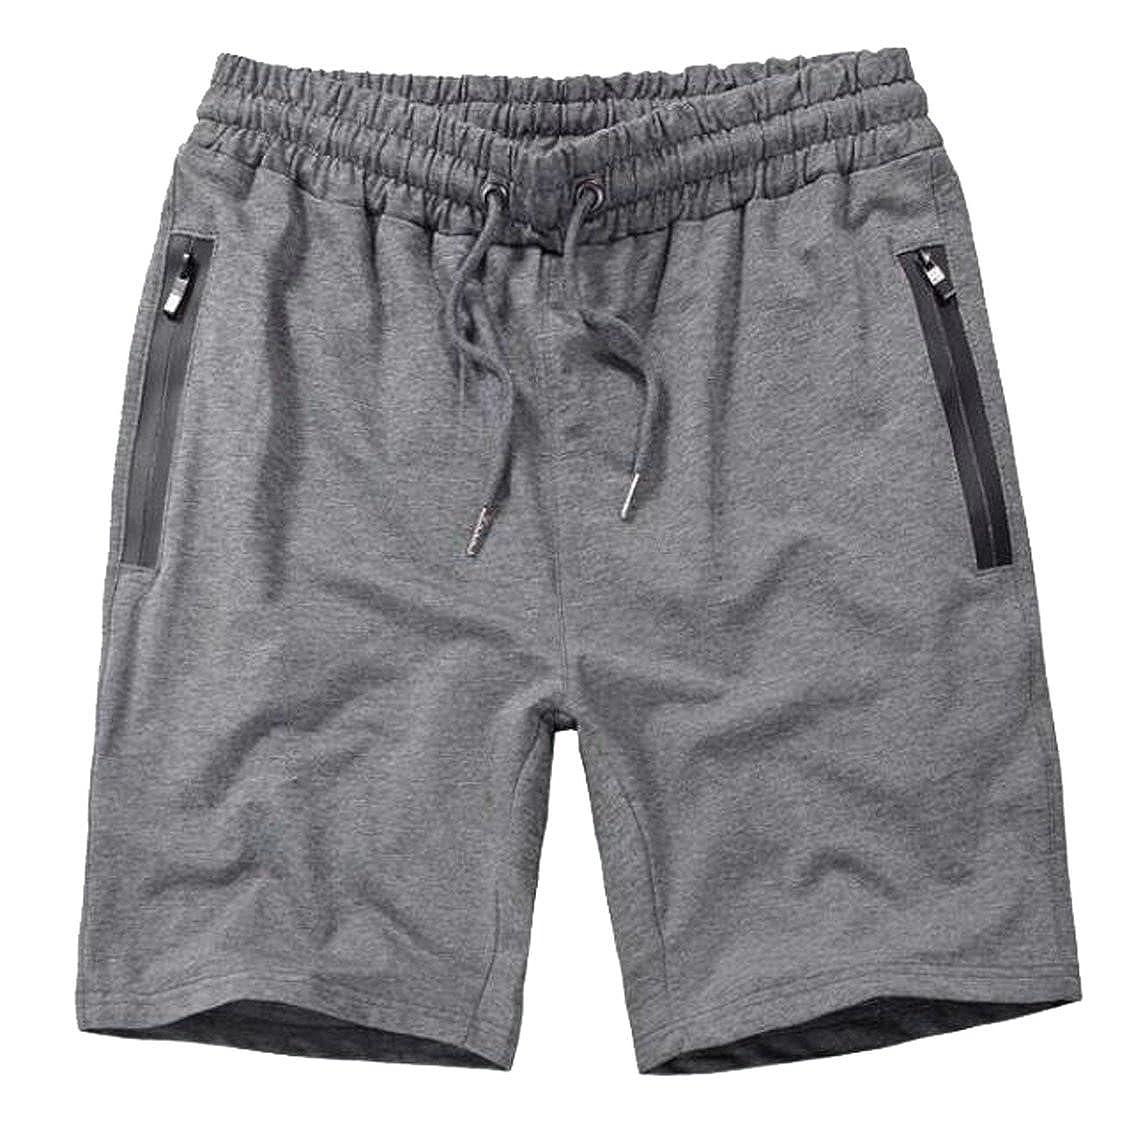 SYTX Mens Summer Solid Elastic Waist Sports Shorts Beach Board Shorts